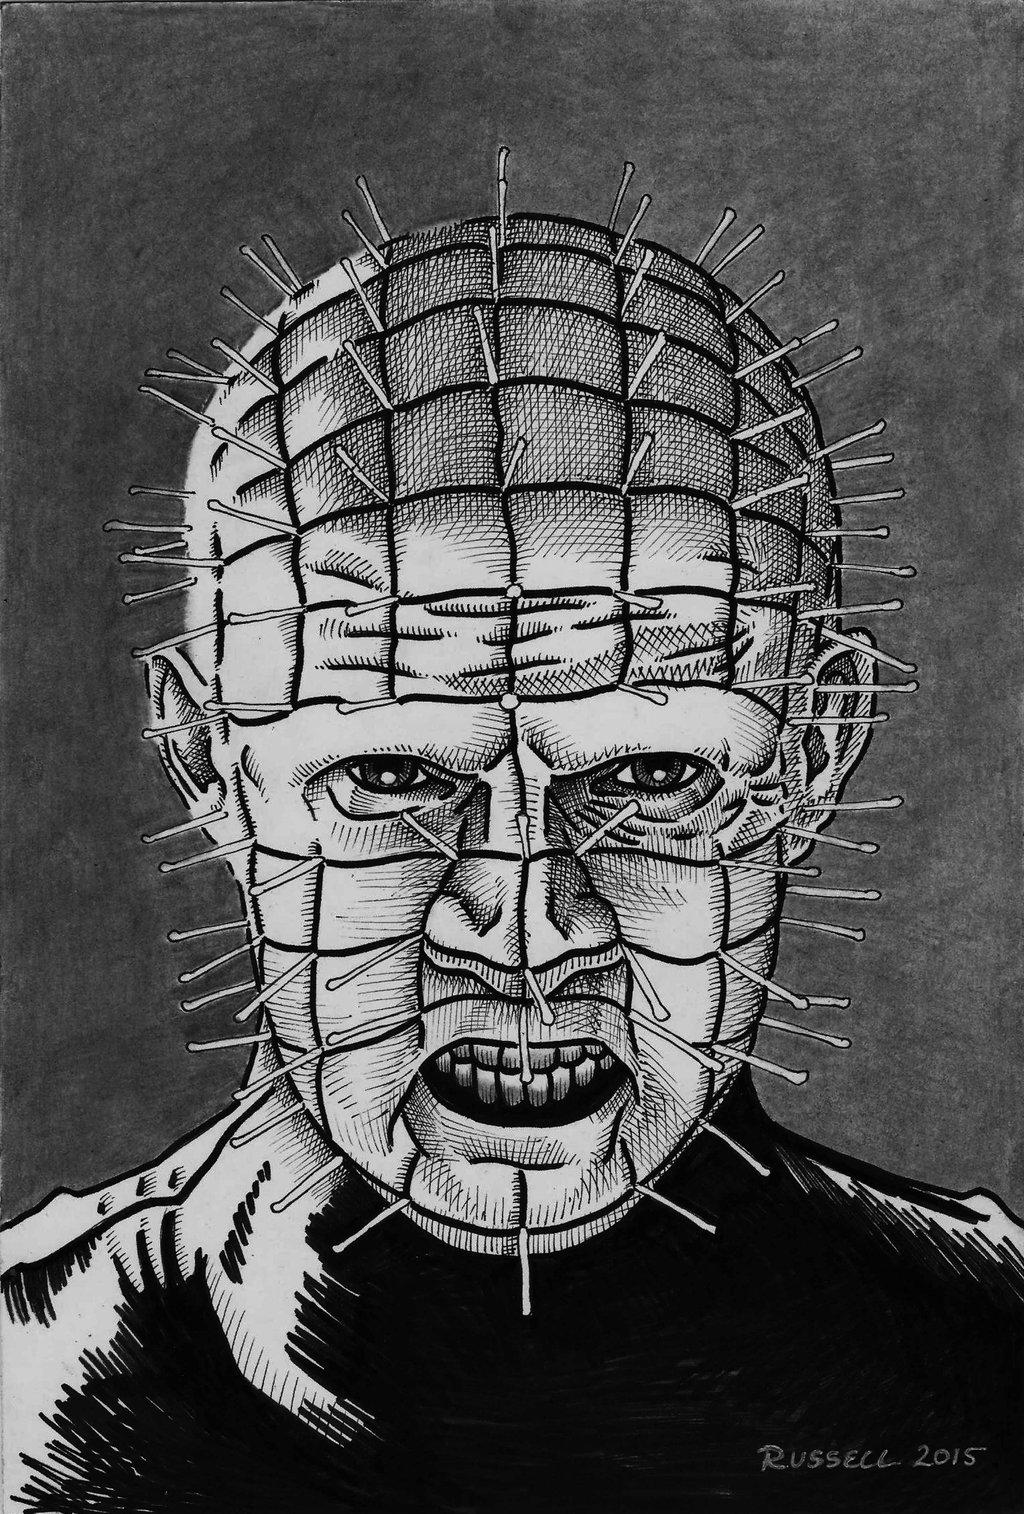 Drawn pinhead Bungle0 DeviantArt by Bungle0 Pinhead